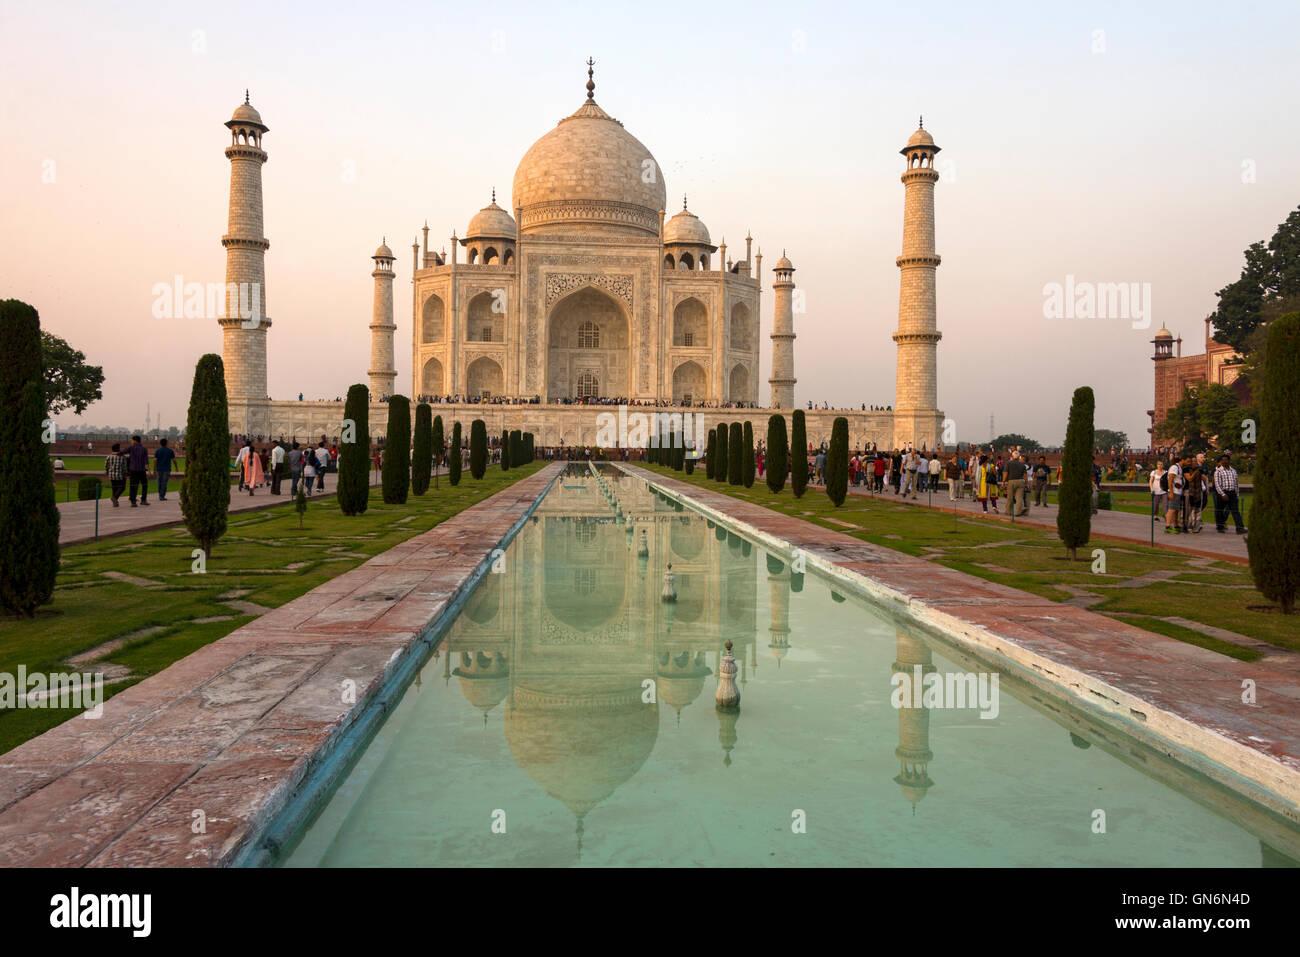 Tramonto sul Taj Mahal e vasca ornamentale in Agra, Uttar Pradesh, India Immagini Stock